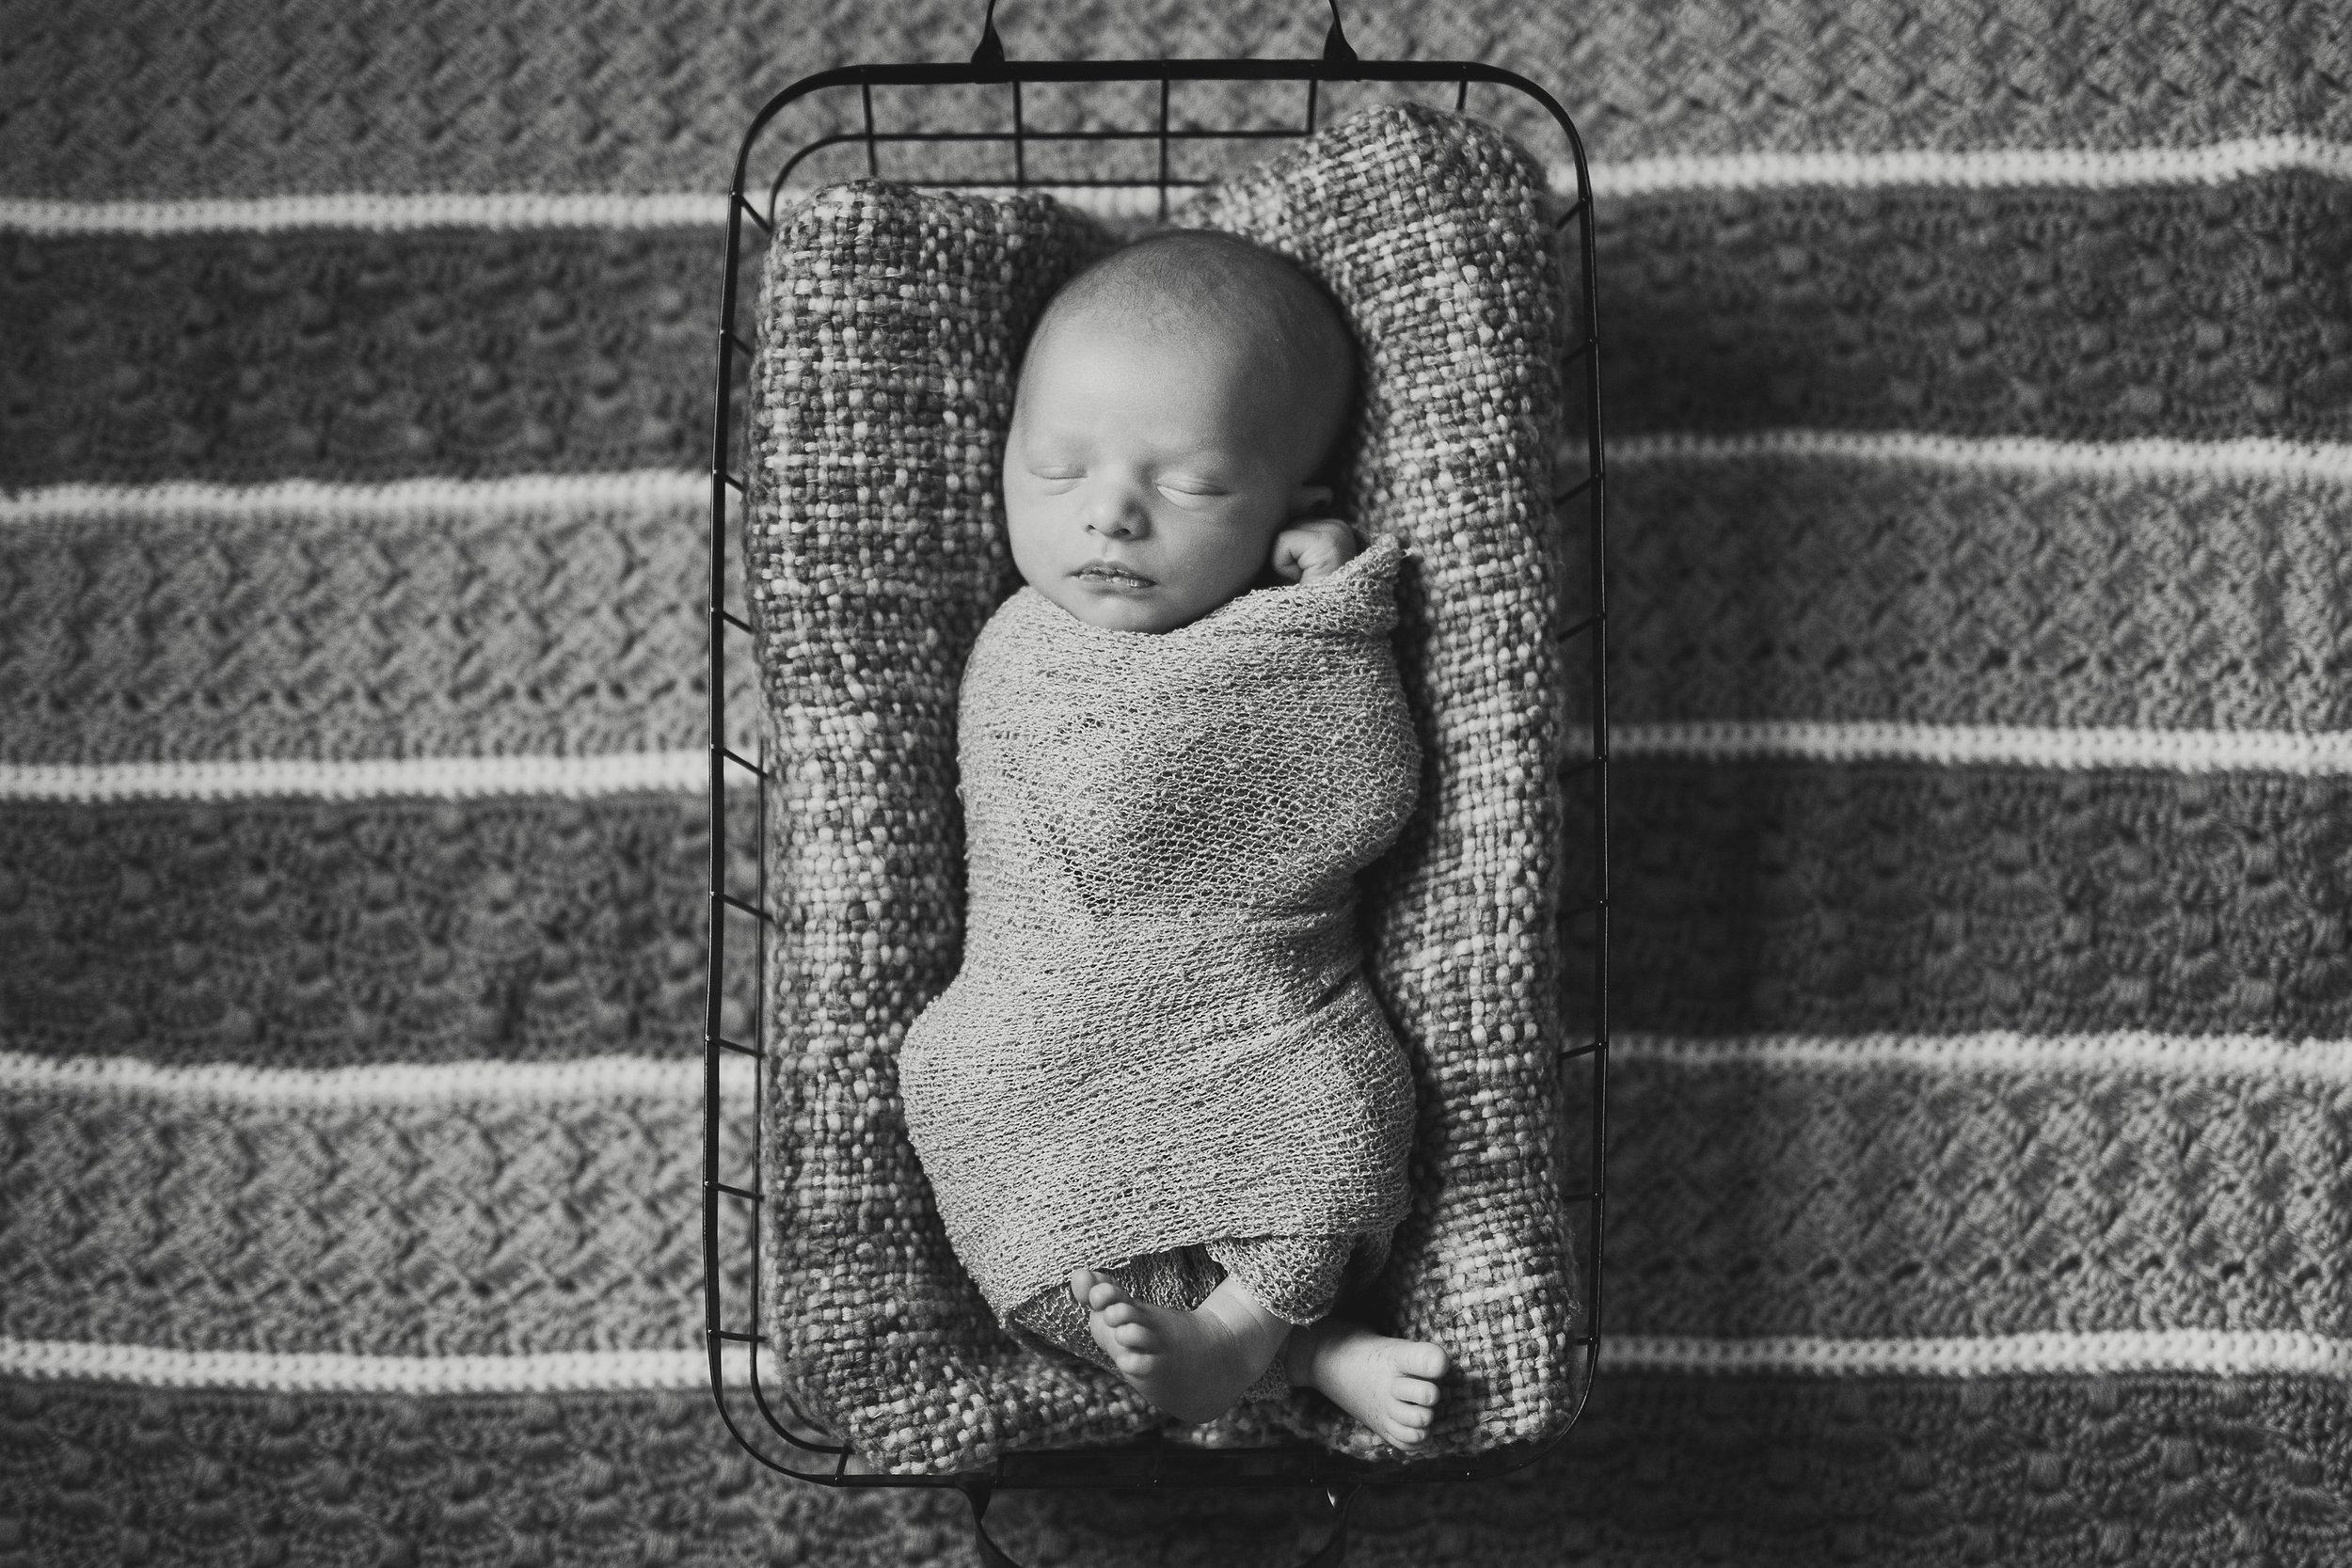 26-StaciDesign_Leo-Newborn-4O2A8734.jpg